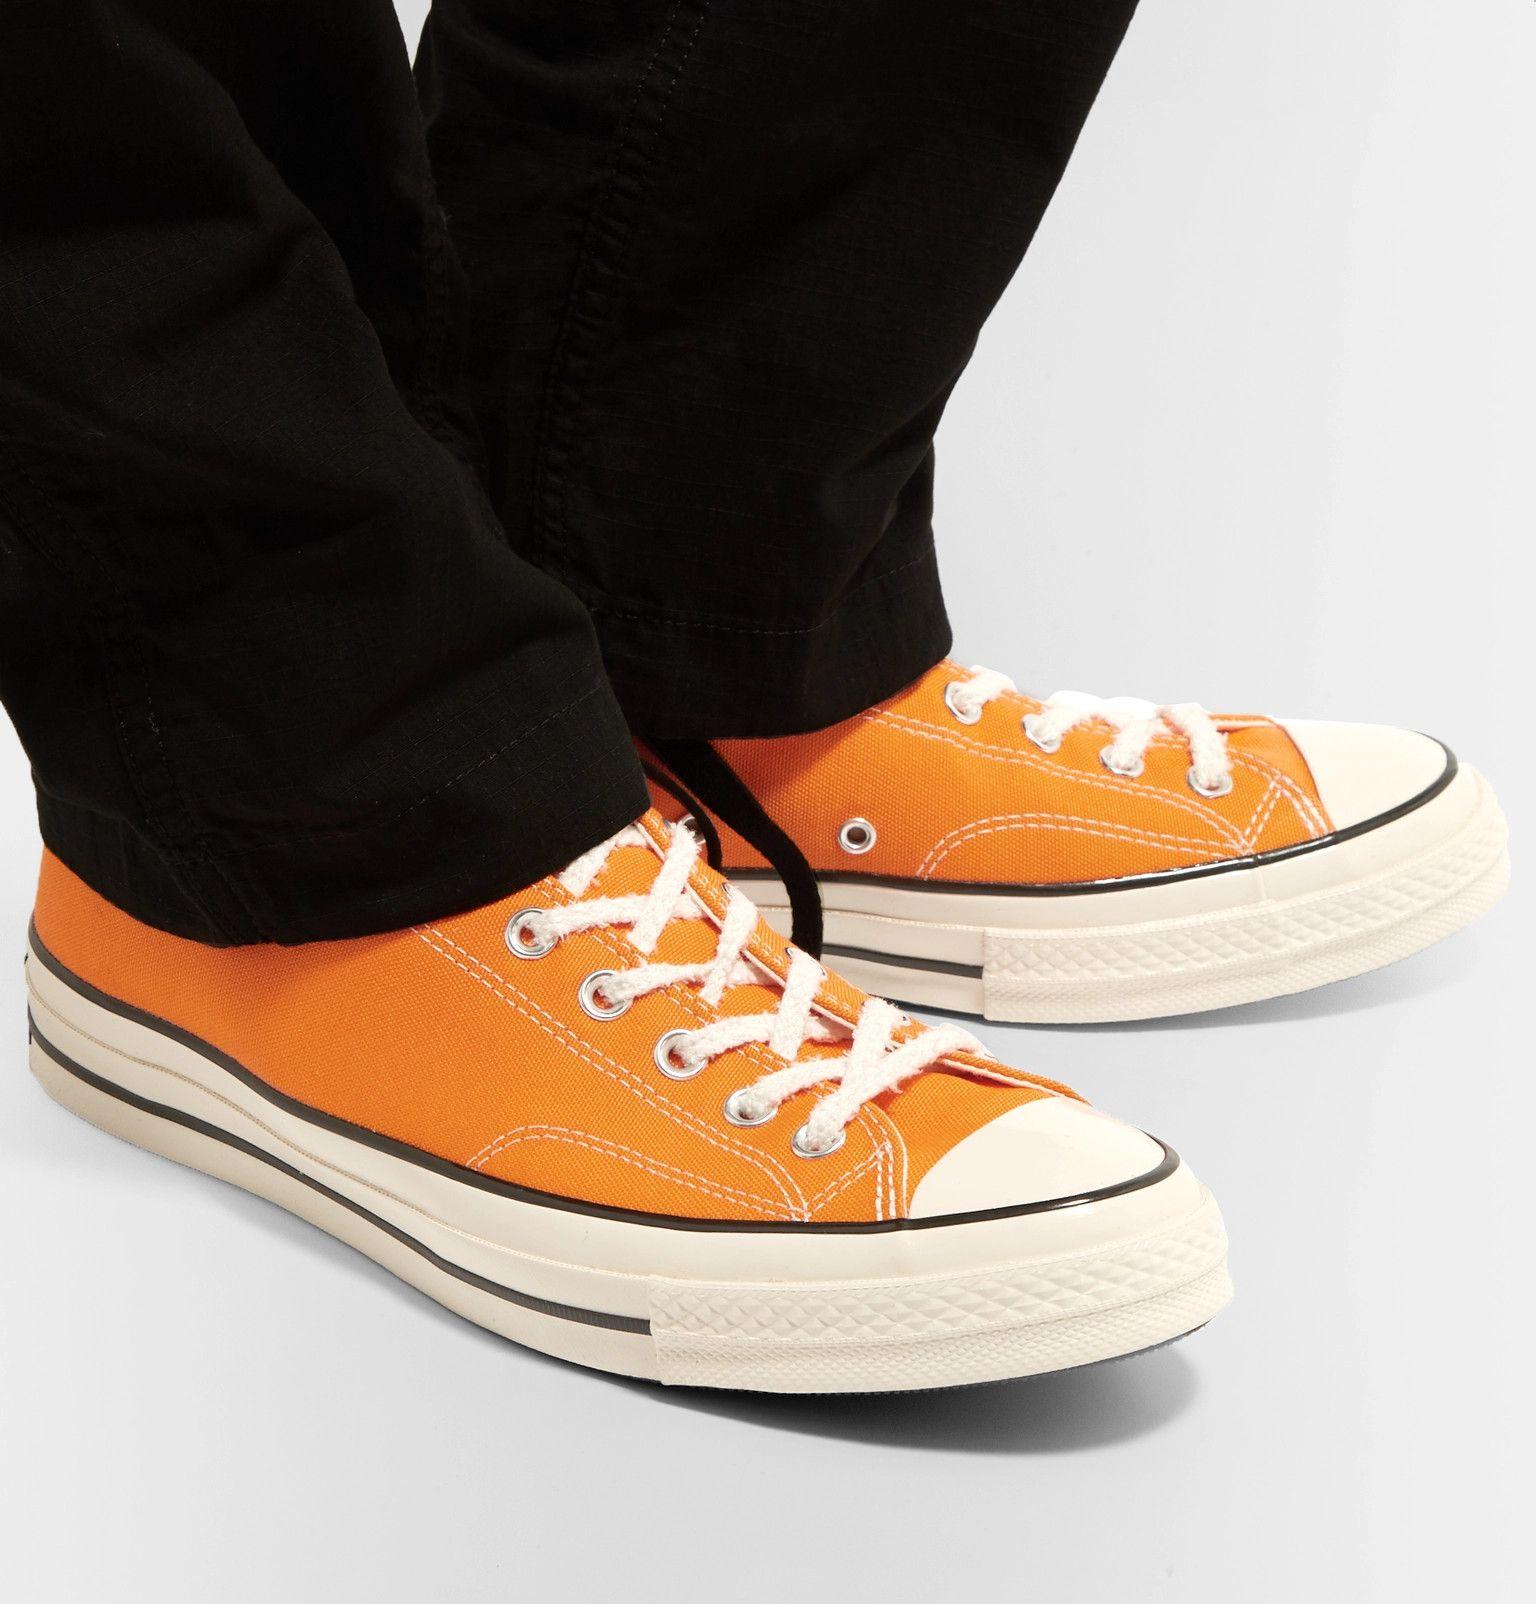 Converse Orange Chuck 70 Low Top